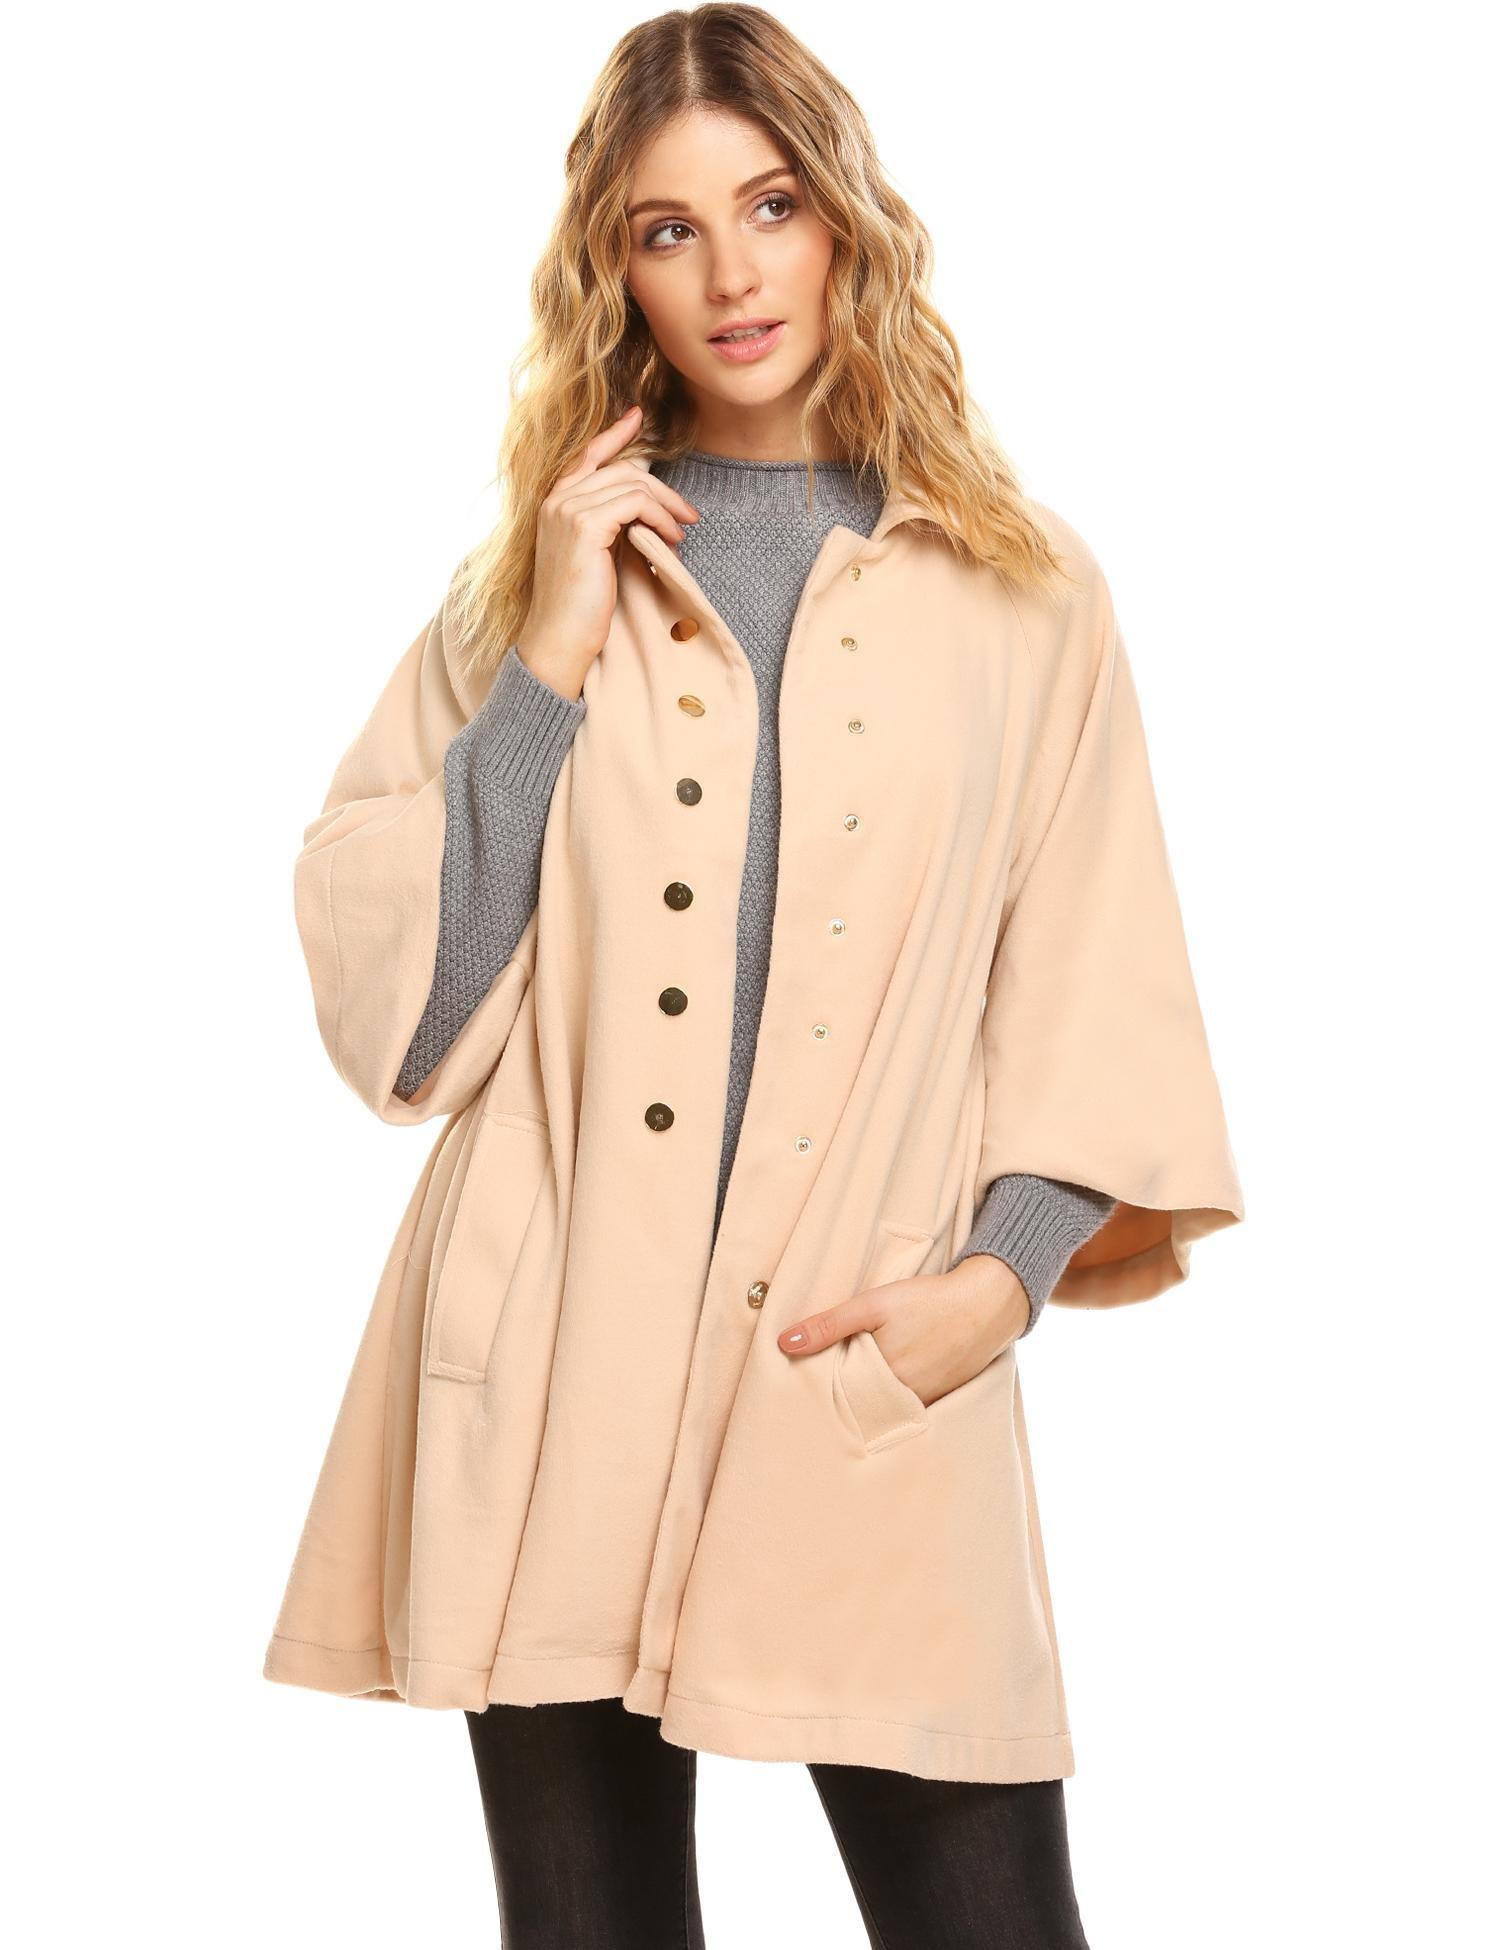 Corgy Women's Plus Size Jacket Swing Style Coat For Winter